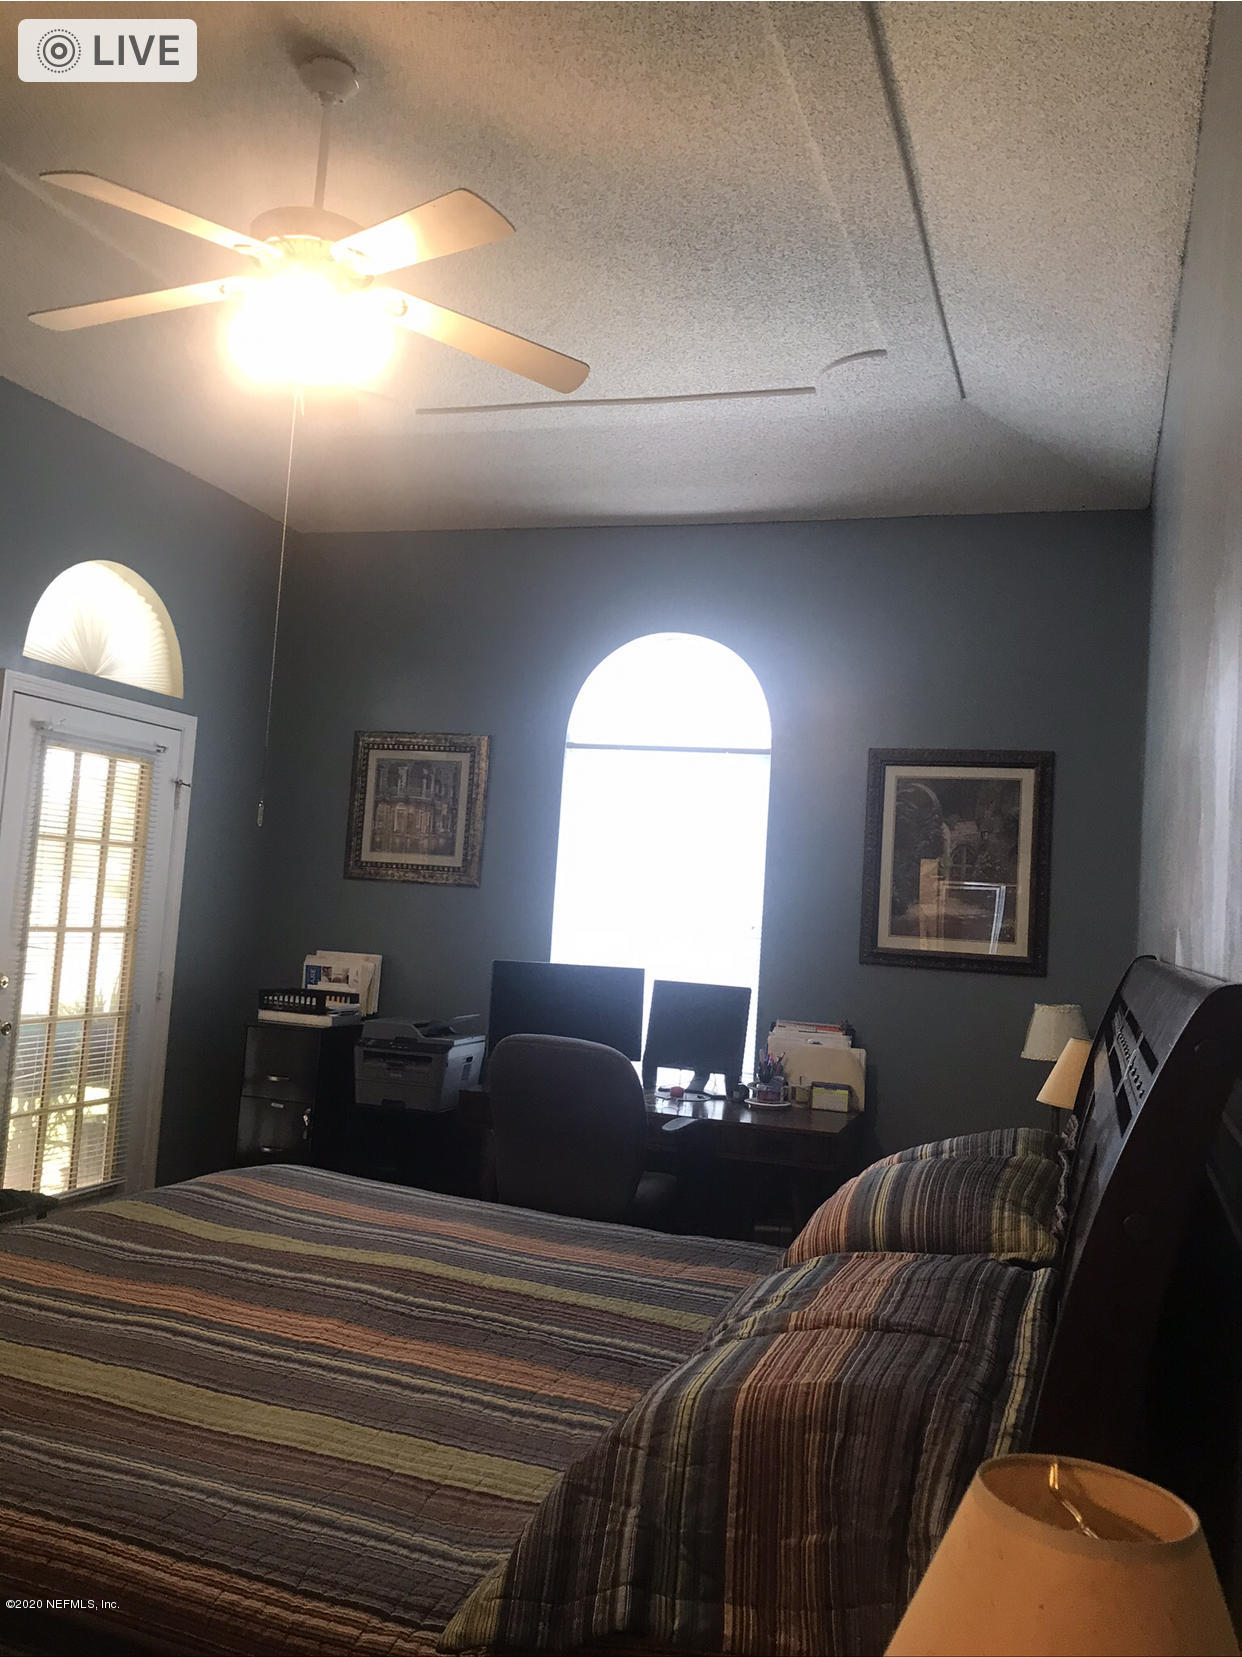 6003 BROOKEHAVENS, PALATKA, FLORIDA 32177, 2 Bedrooms Bedrooms, ,2 BathroomsBathrooms,Residential,For sale,BROOKEHAVENS,1049476